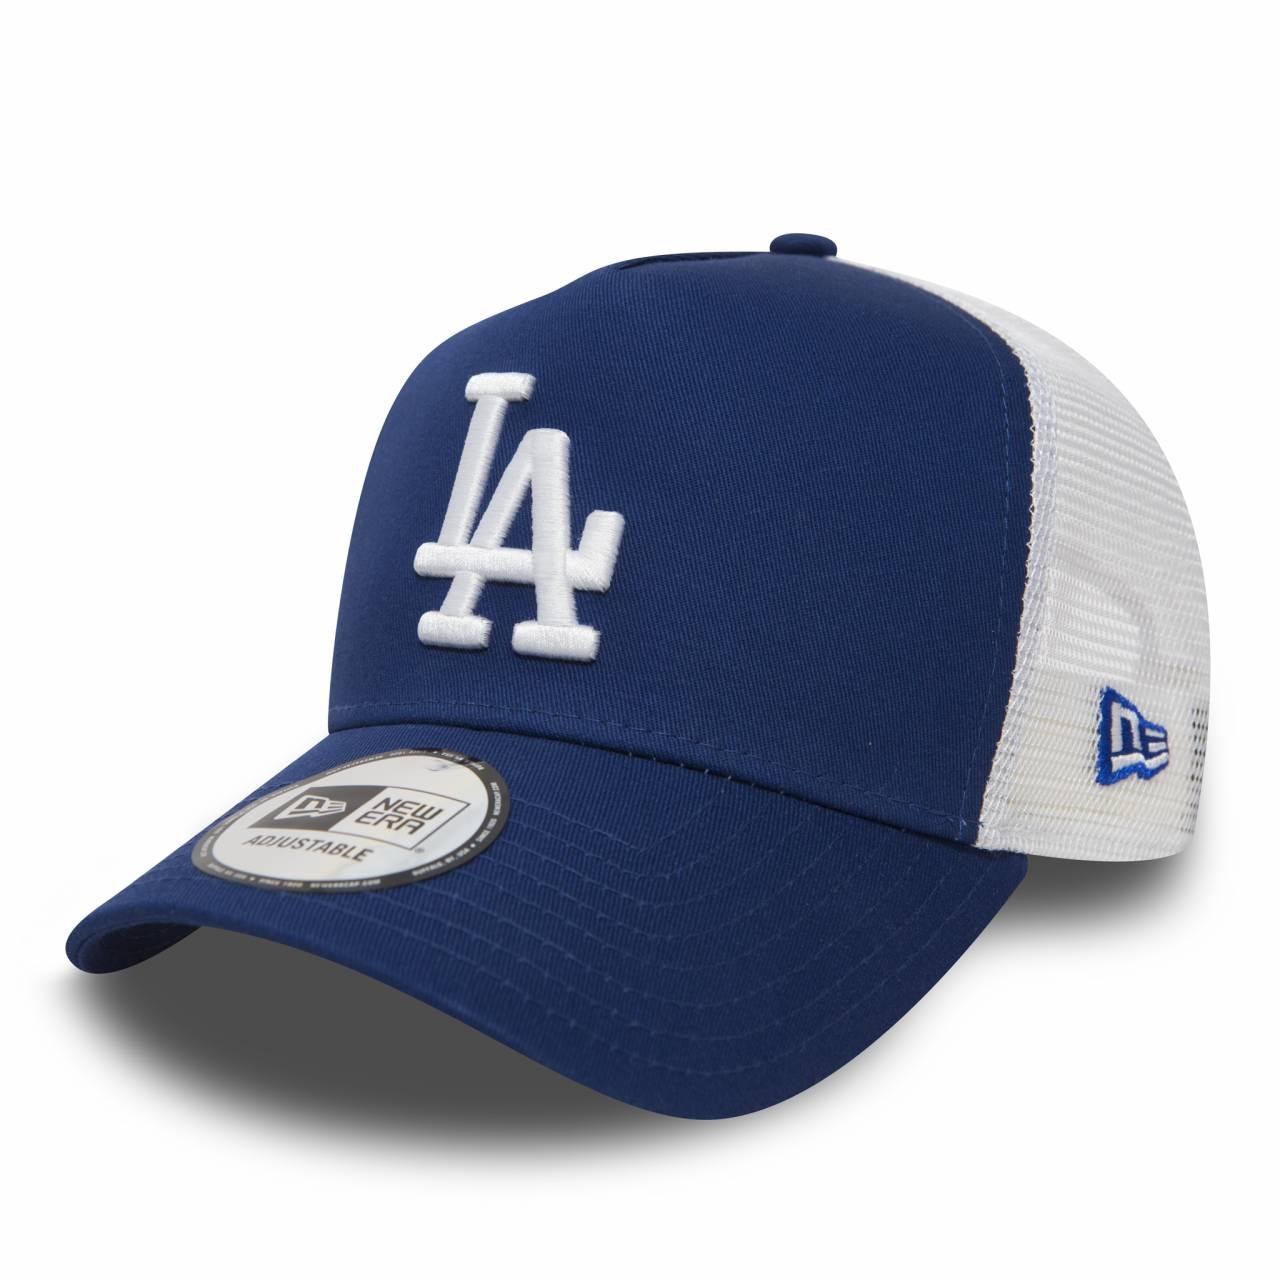 11405497 MLB TRUCKER LOS ANGELES DODGERS BLUE/WHITE CAP